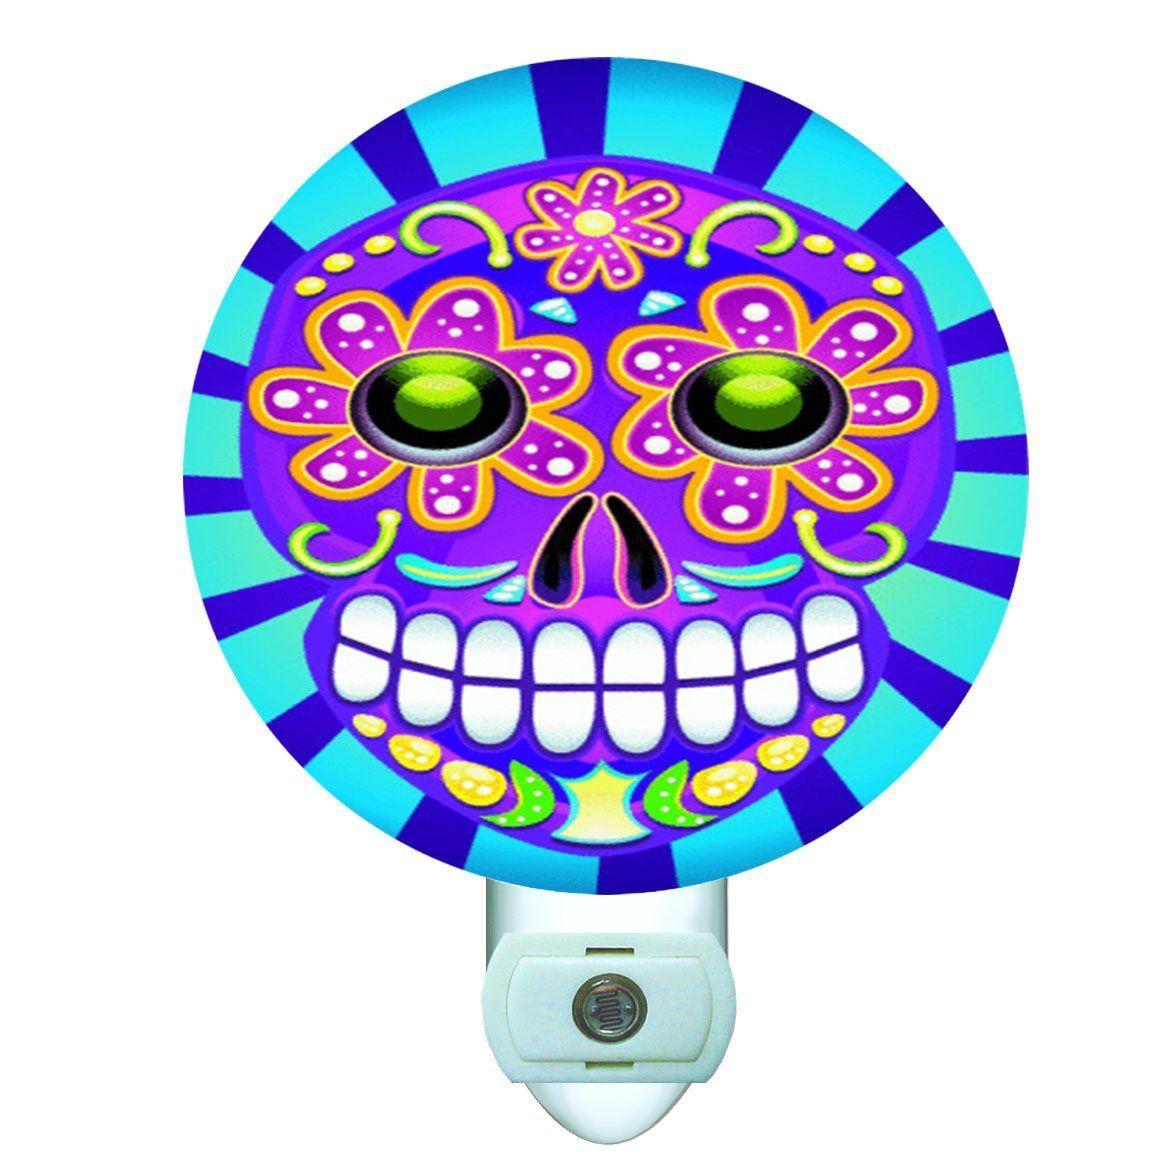 Day of the Dead Skull Decorative Round Night Light